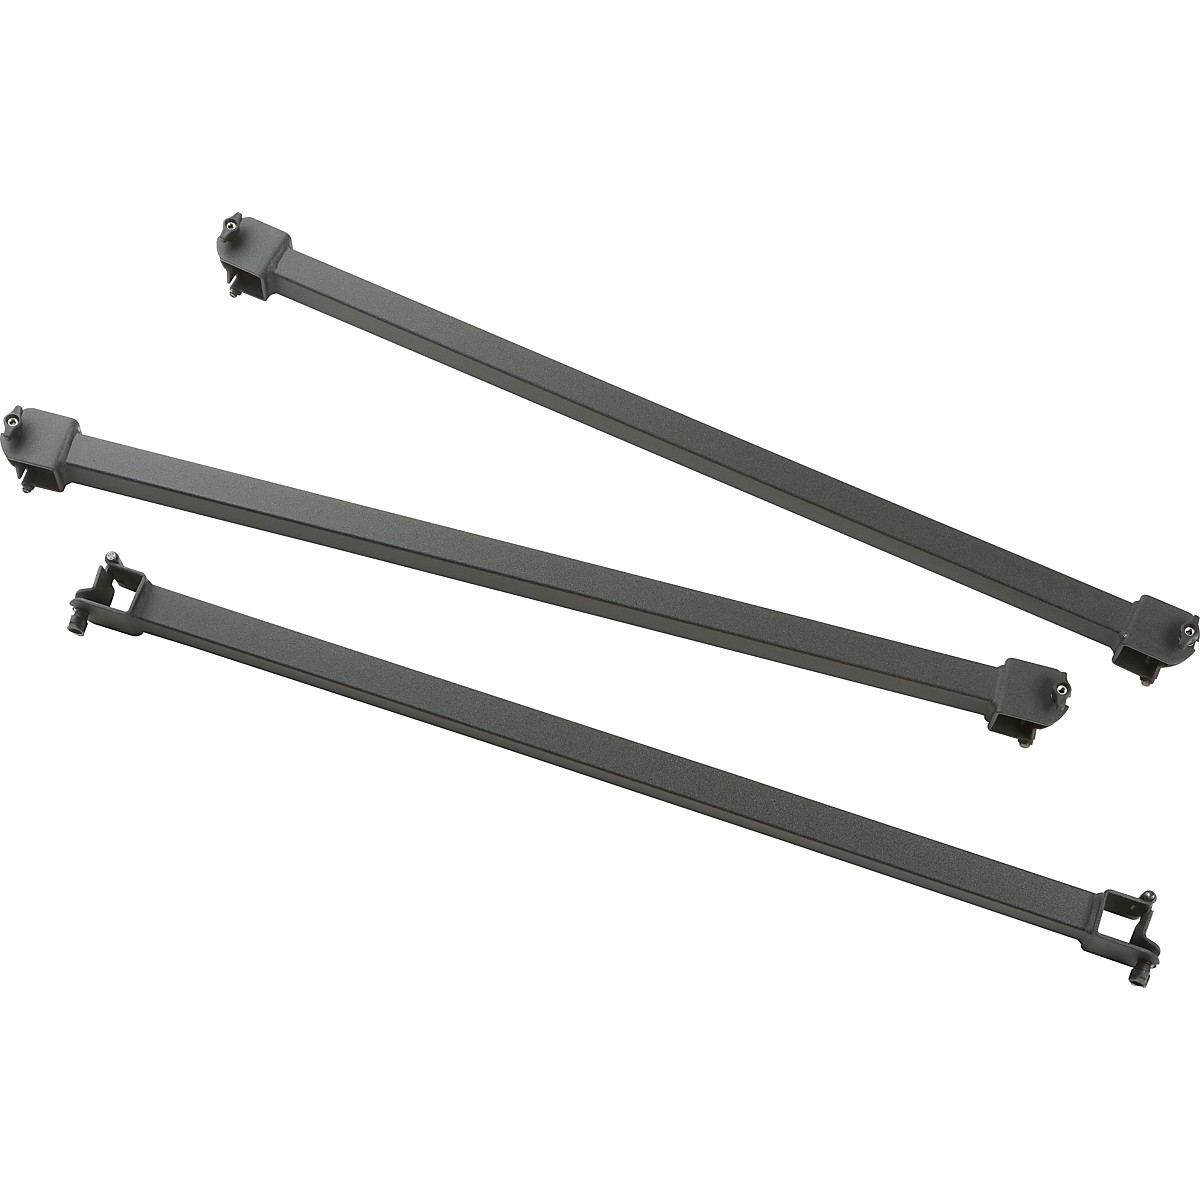 Adams Fixed Crossbars Set of 3